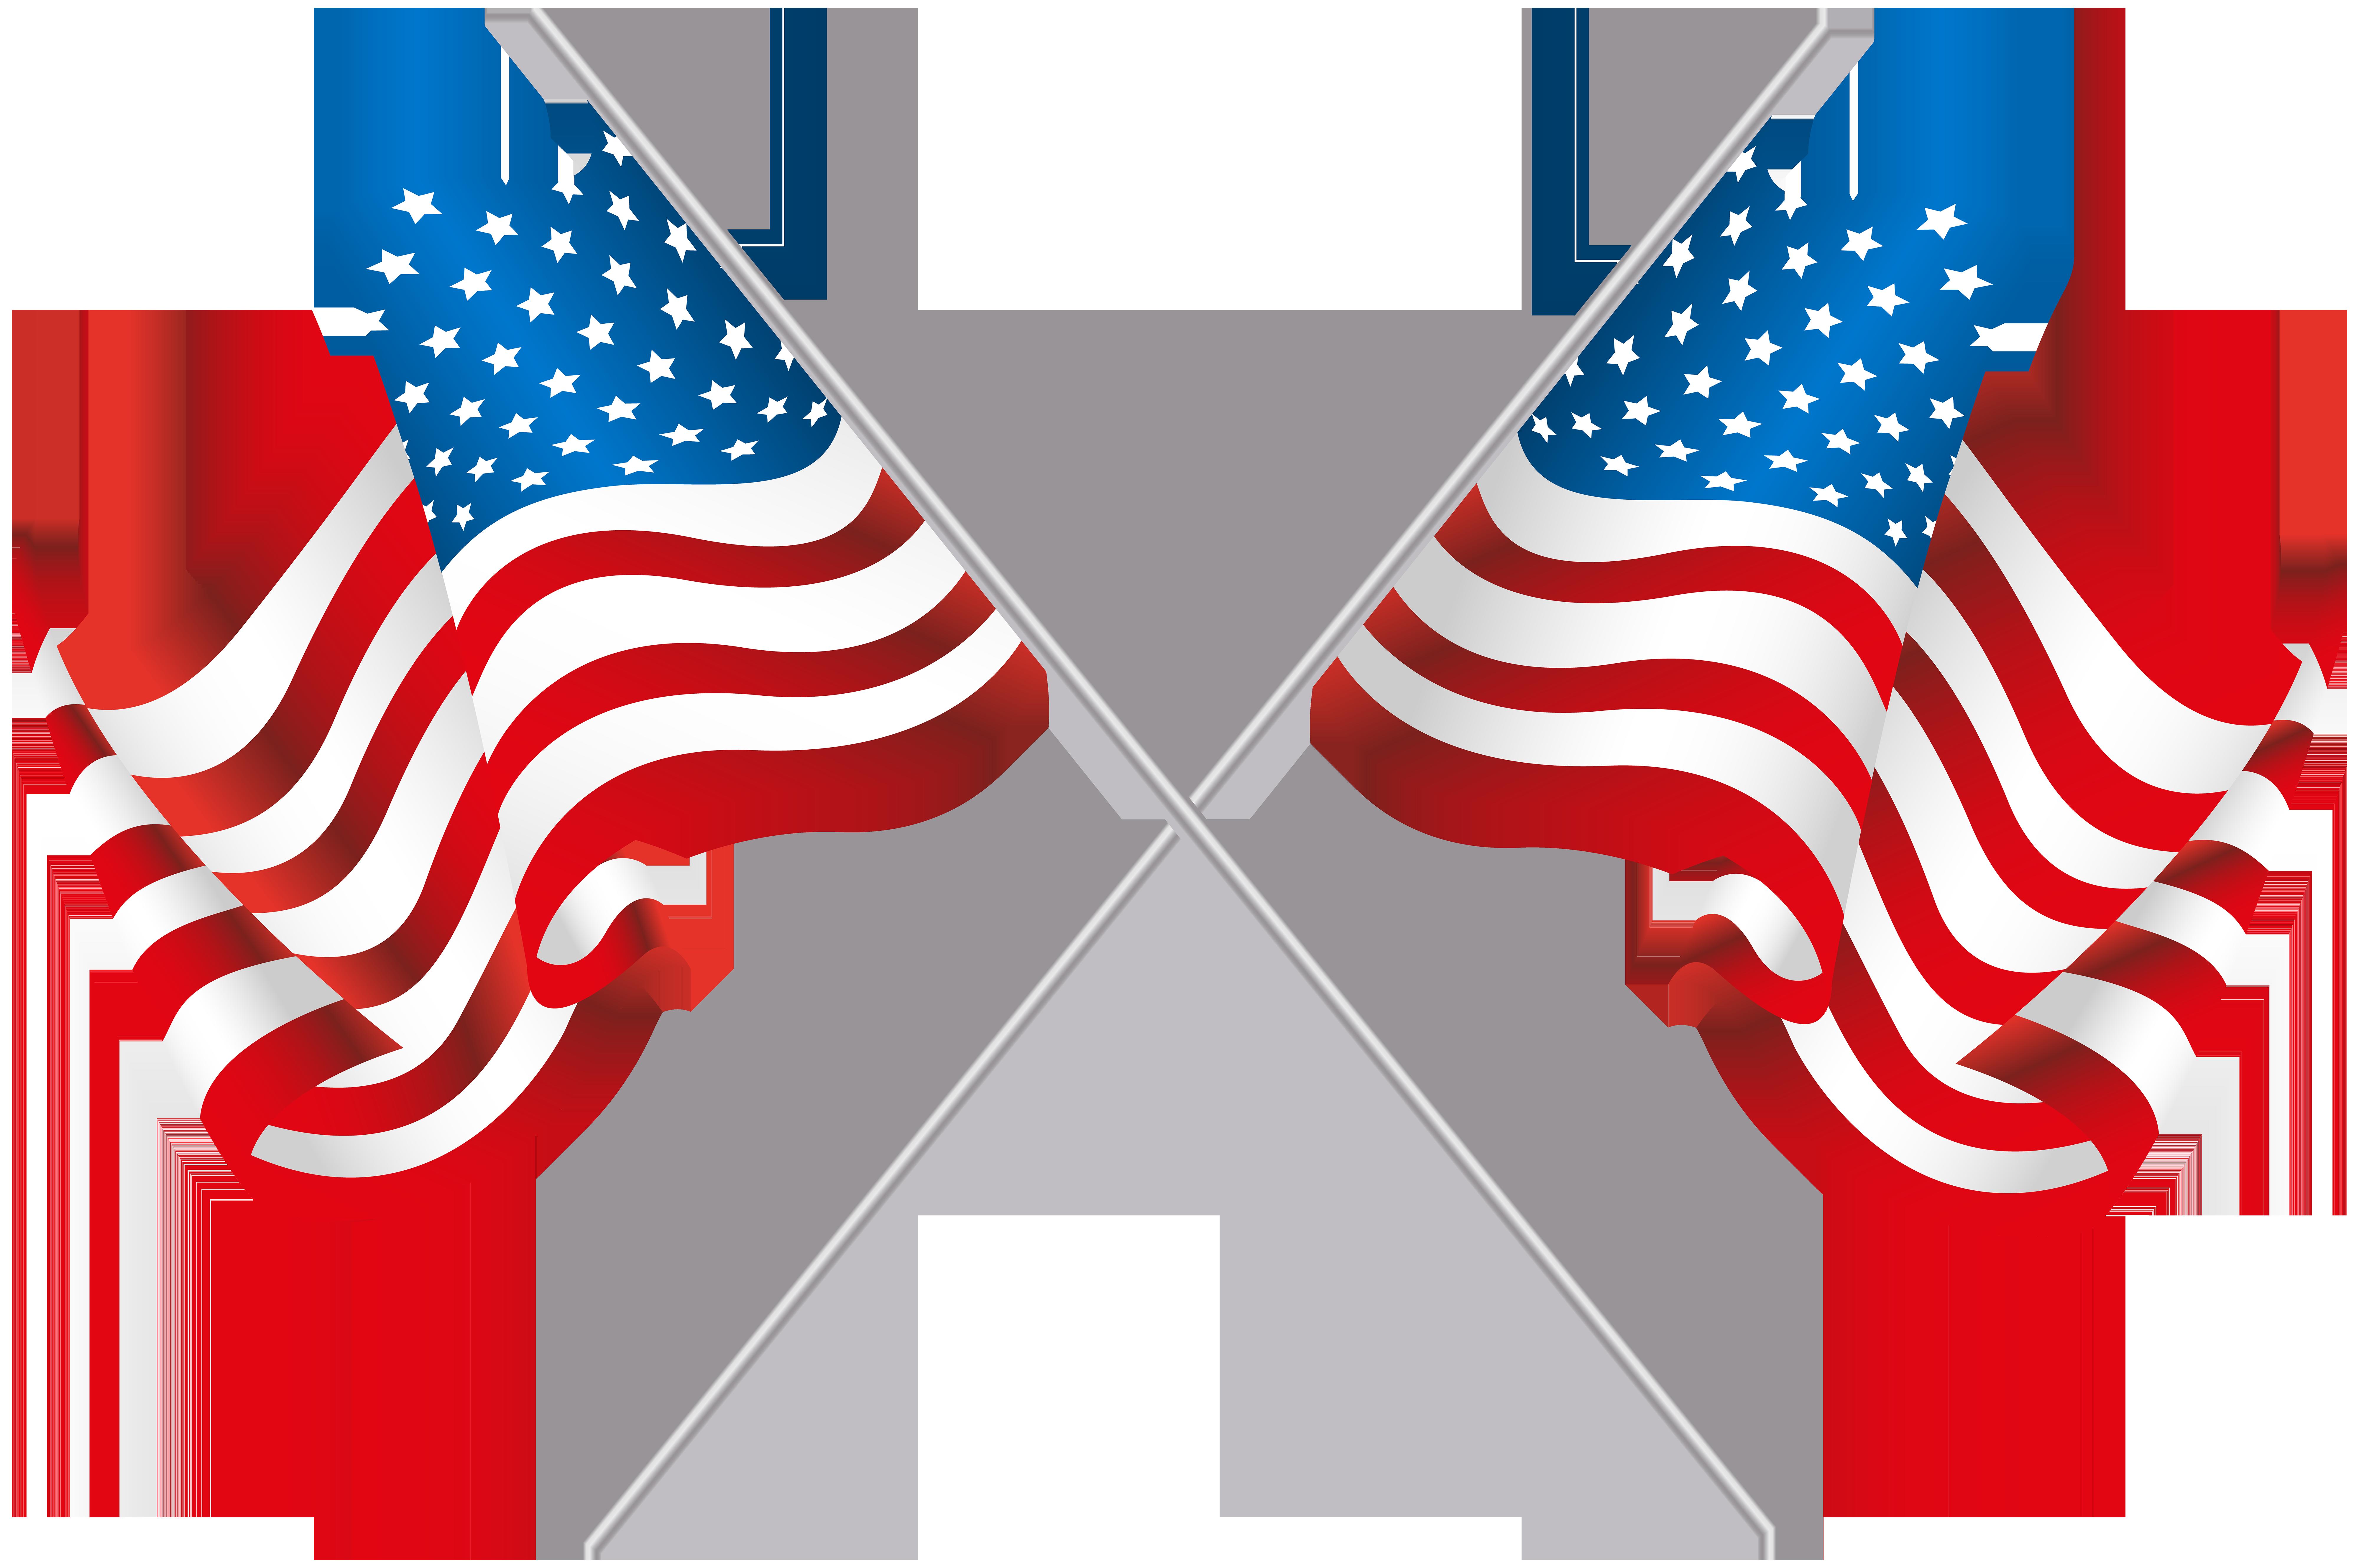 Fireworks clipart american flag, Fireworks american flag Transparent.